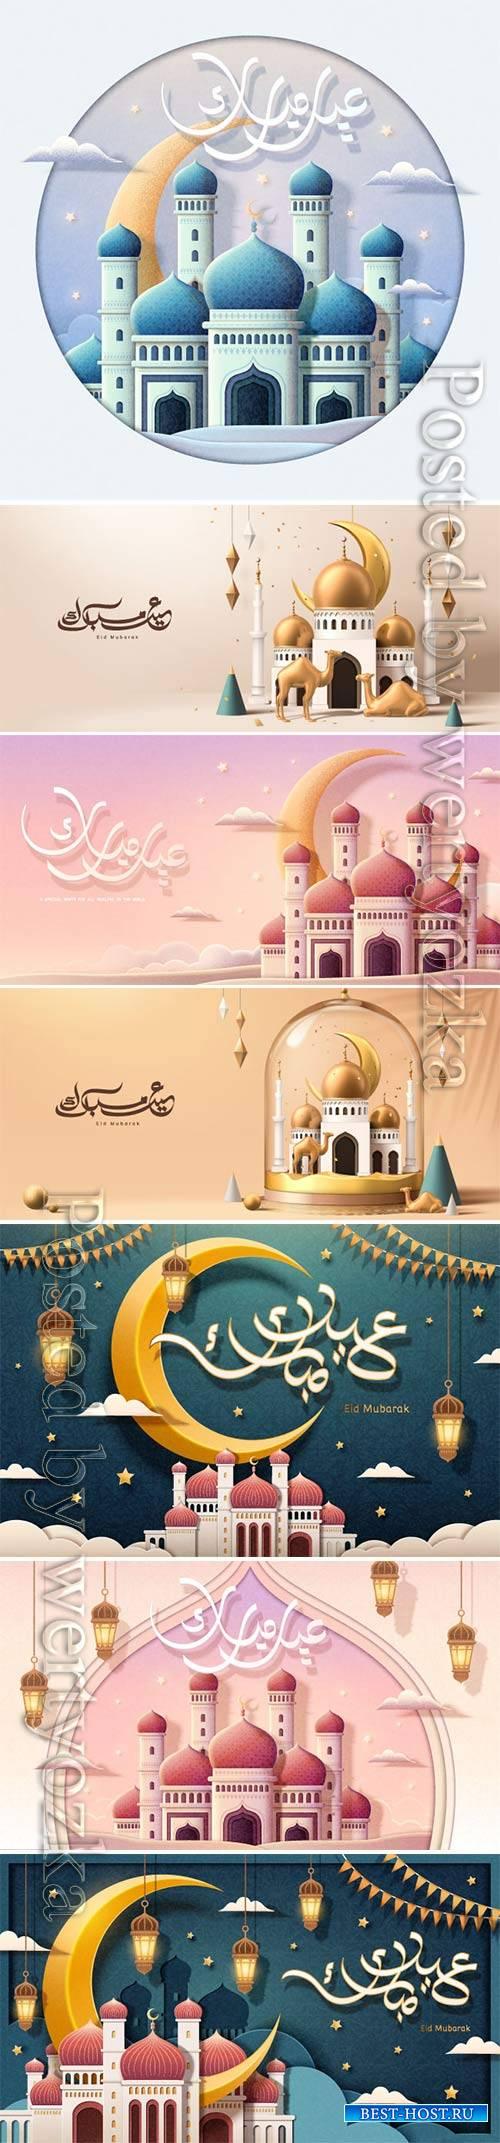 Eid mubarak calligraphy vector banner